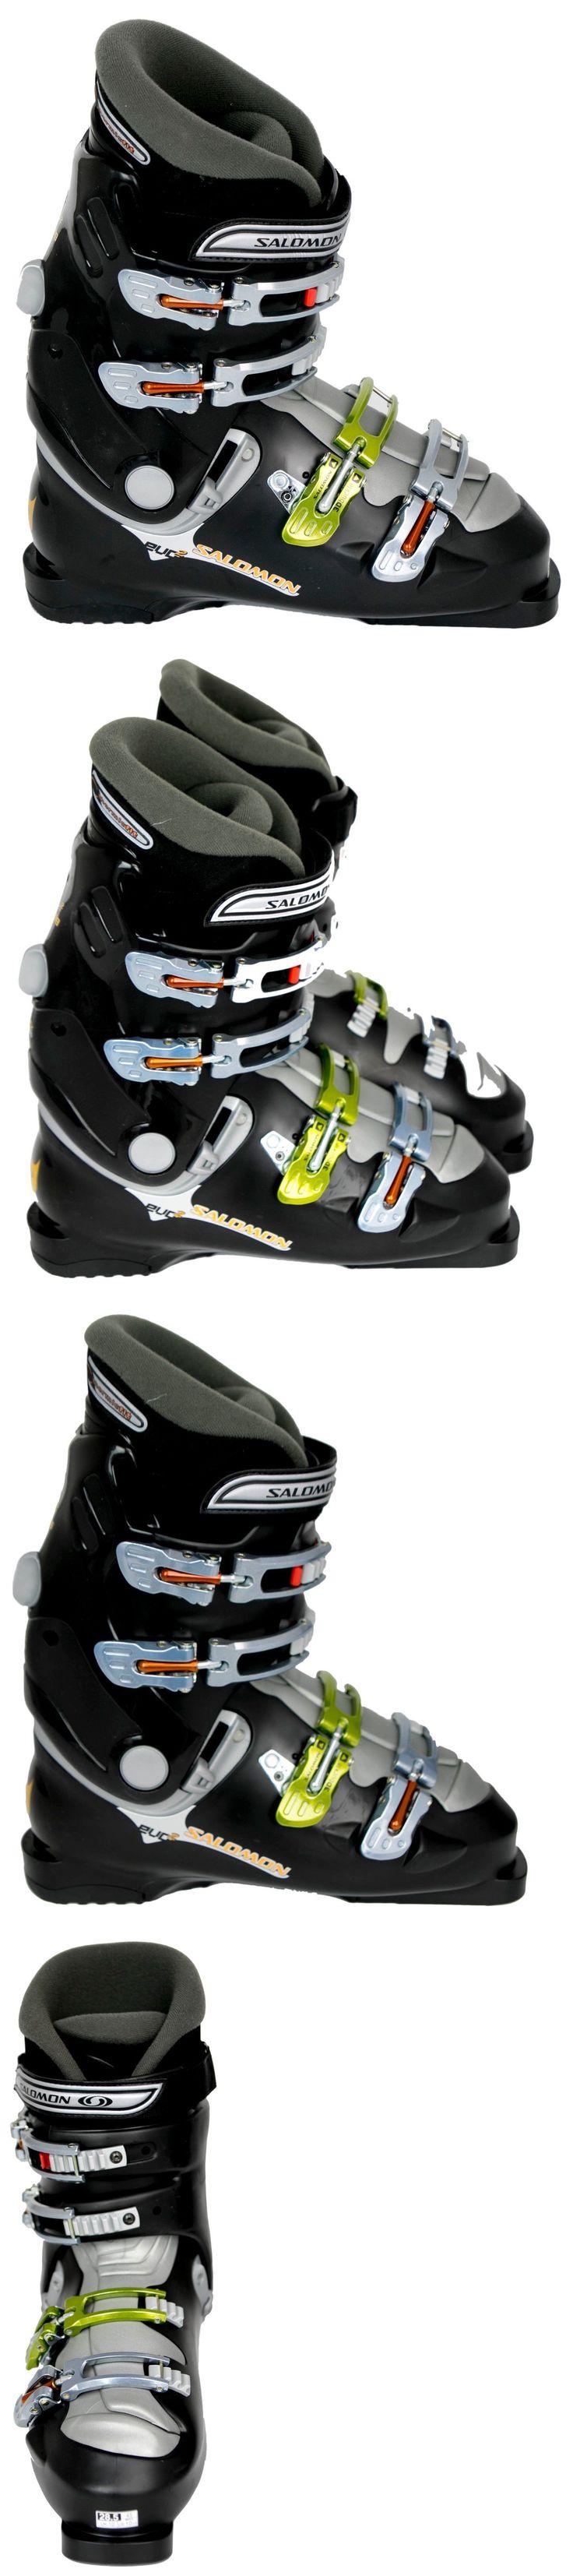 Men 16061: New $400 Mens Salomon Alpine Evo 2 Ski Boots Mondo Size 27.5 28.5 Usa 9.5 10.5 -> BUY IT NOW ONLY: $119 on eBay!